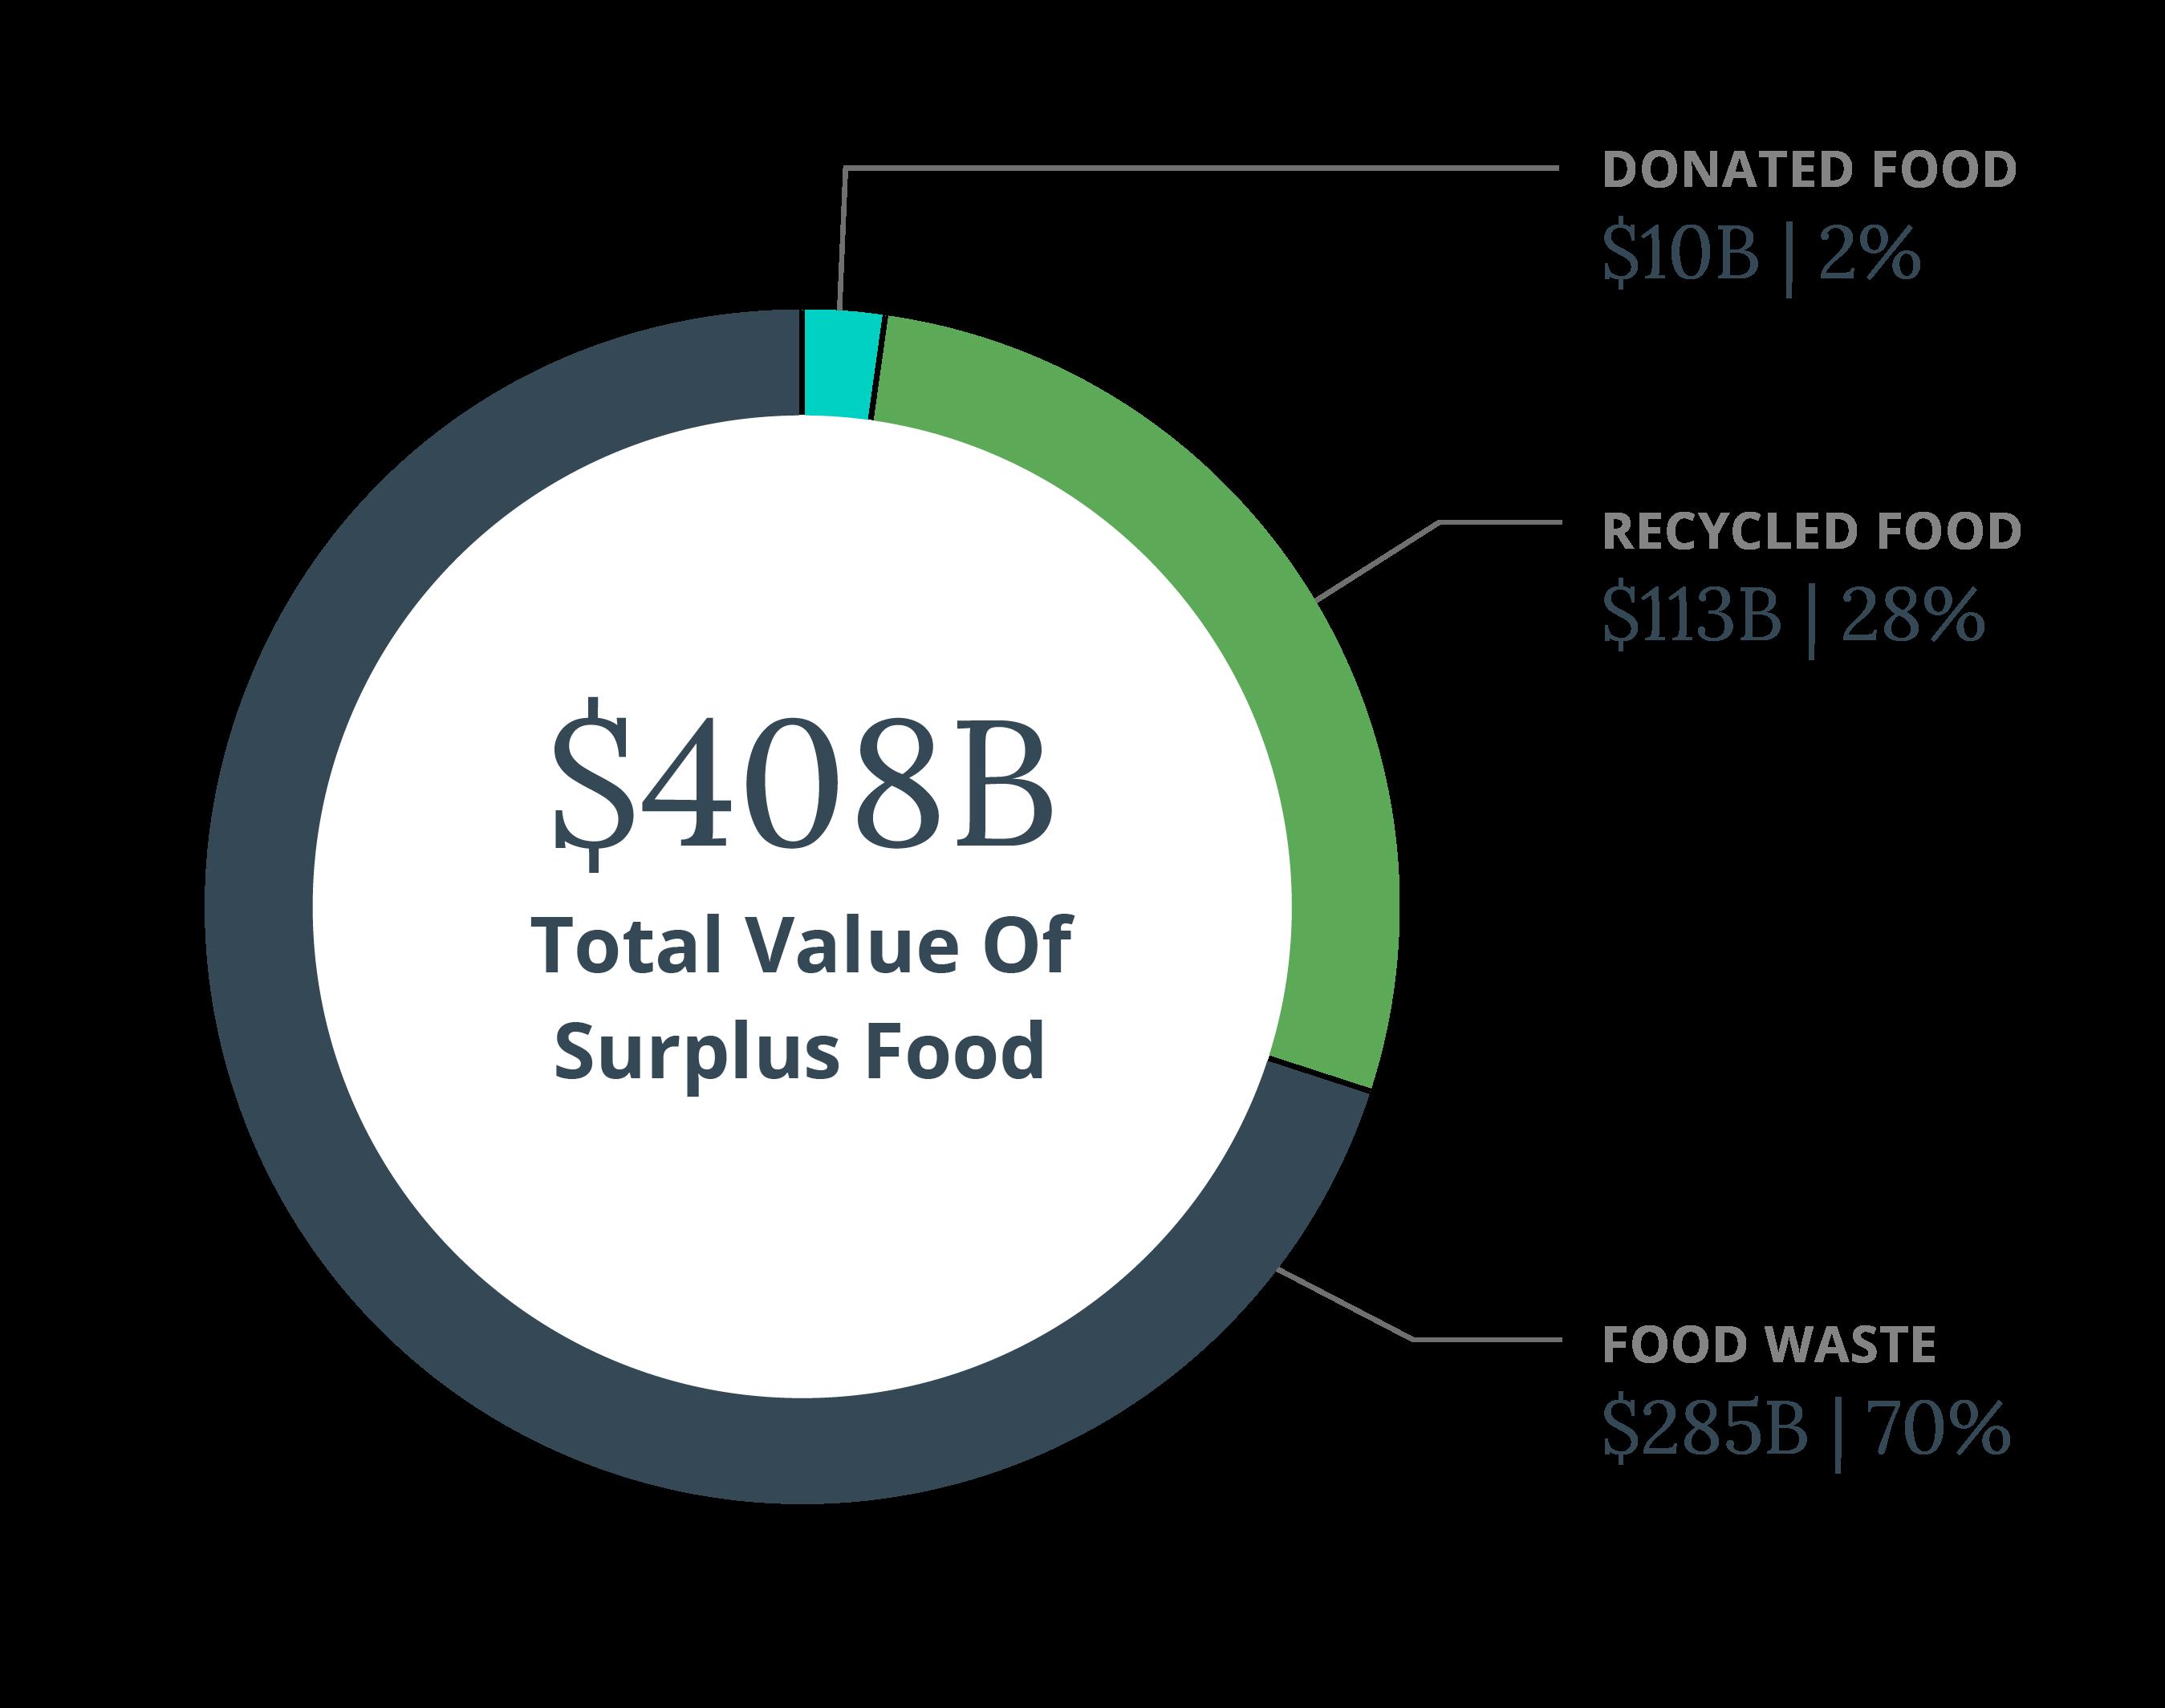 Source: ReFed.com statistics